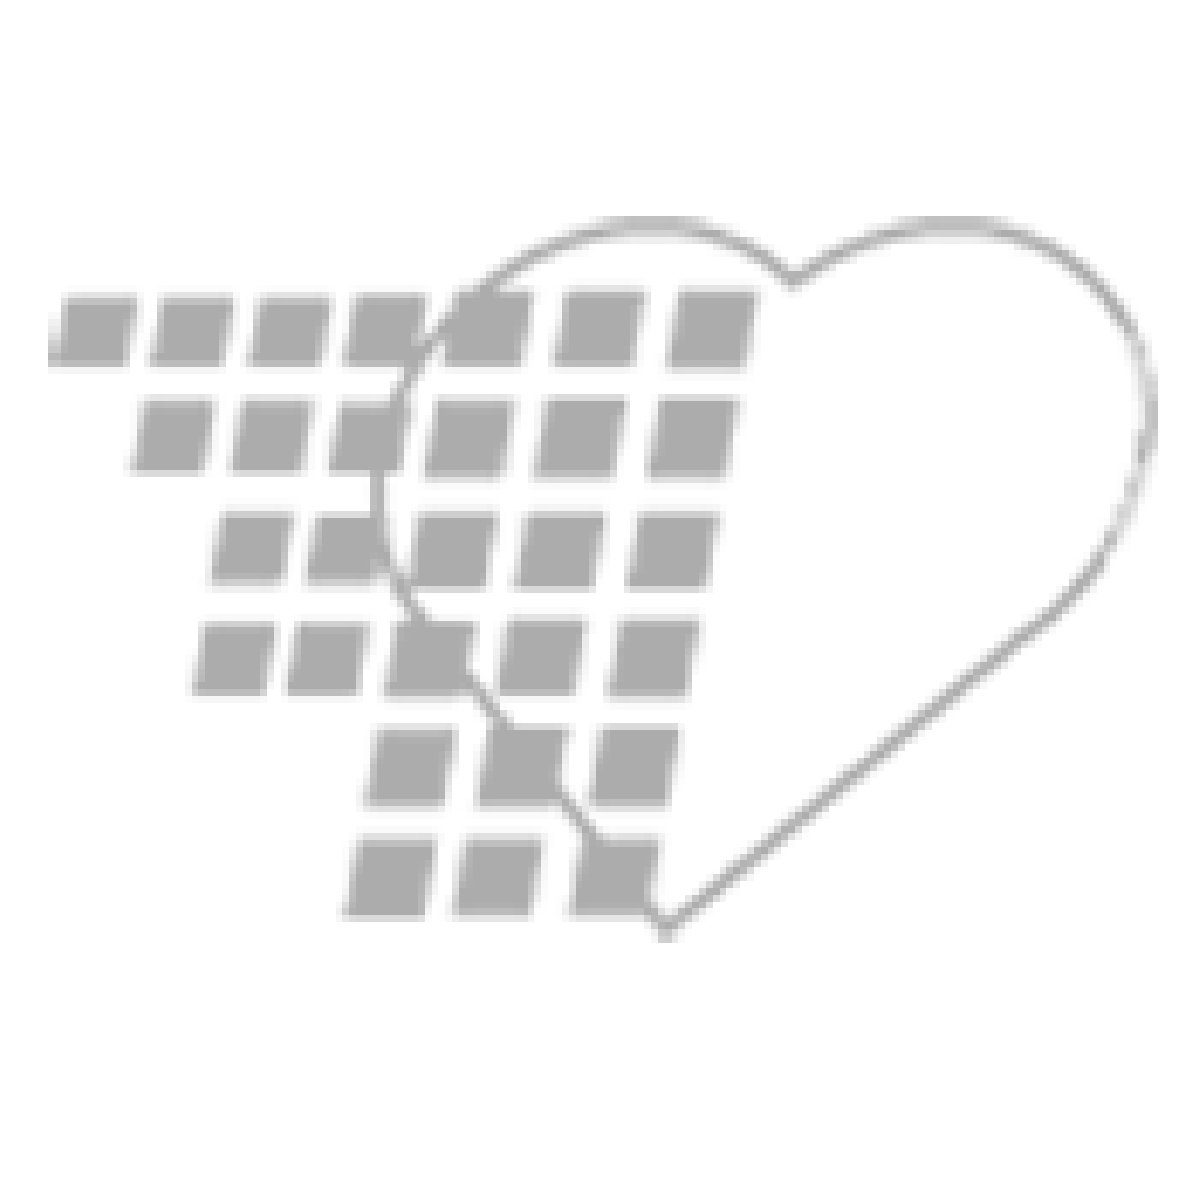 02-20-6021 ADC Advantage™ Automatic Digital Blood Pressure